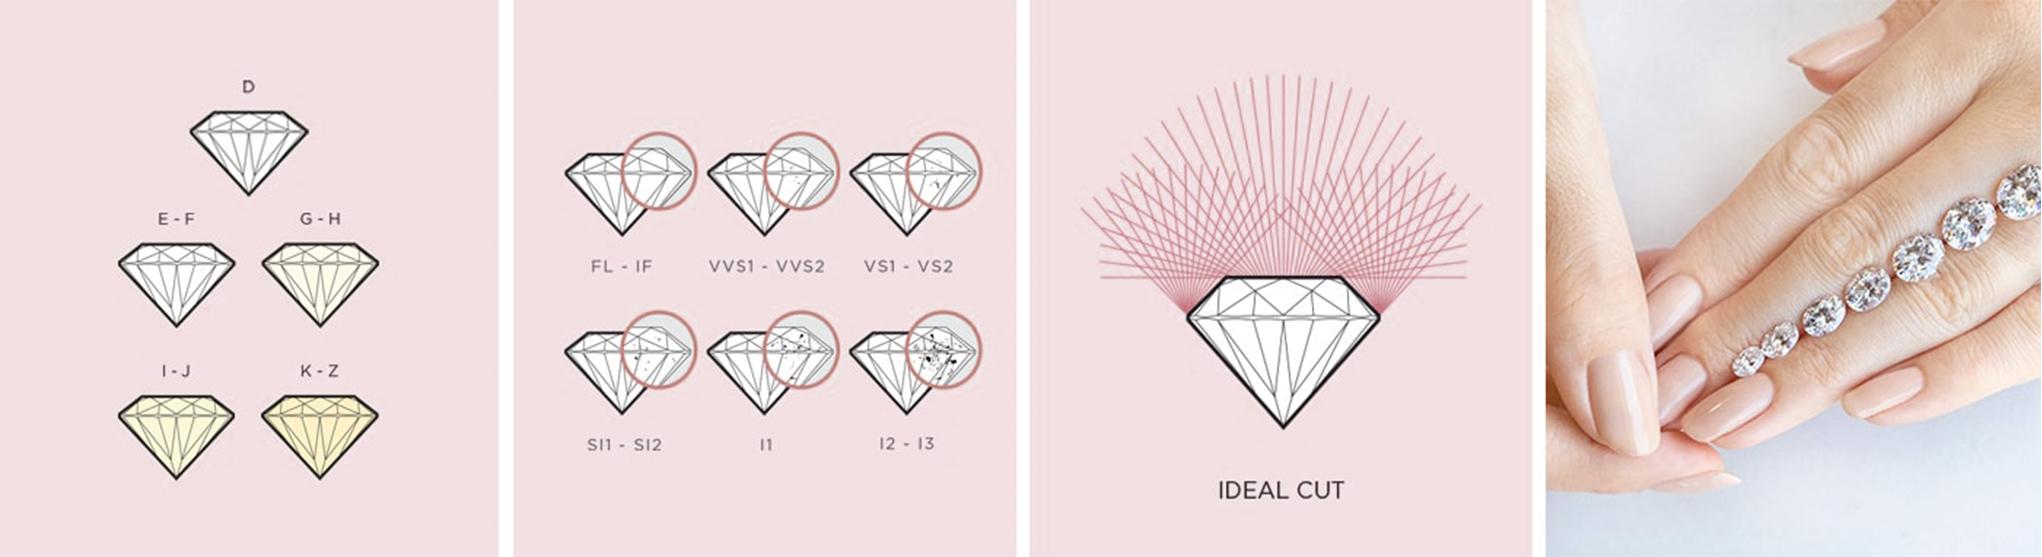 The 4Cs of diamond quality chart.